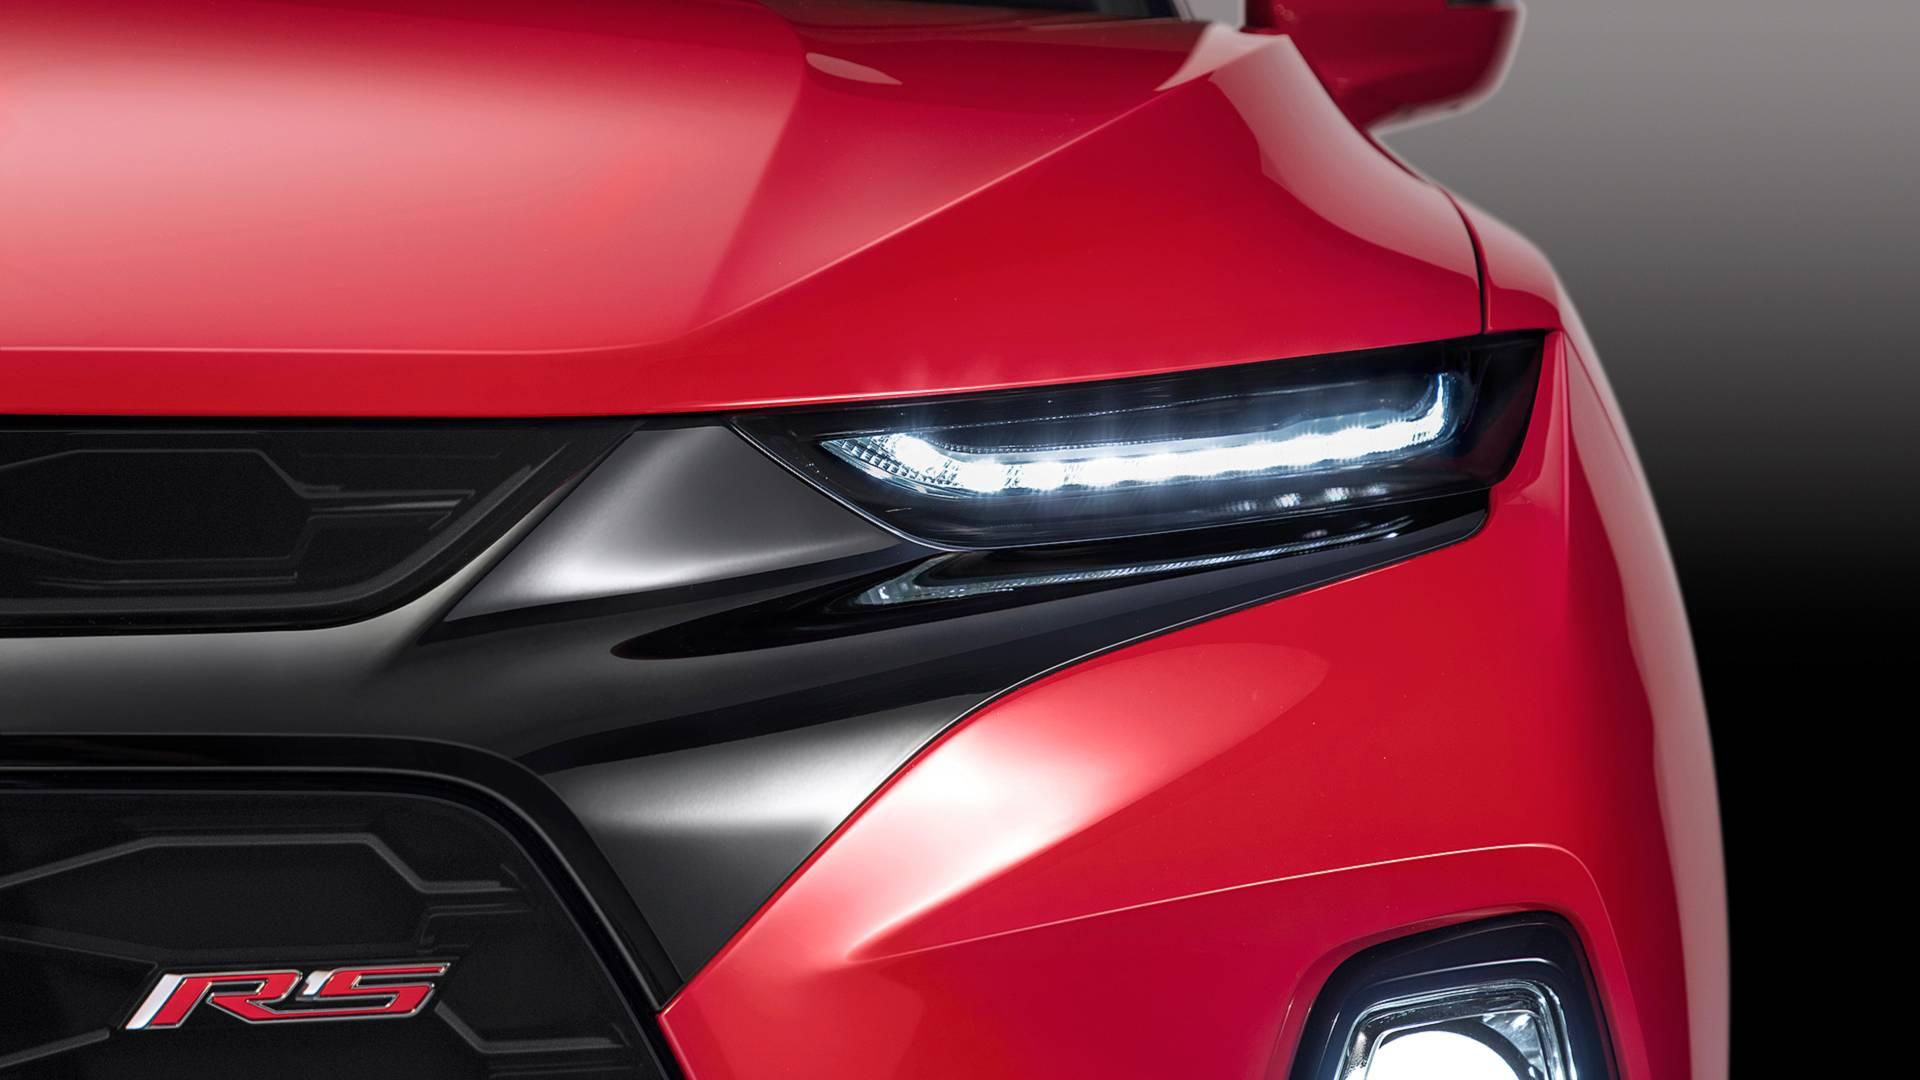 2019 Chevrolet Blazer Gets Detailed on Camera - autoevolution